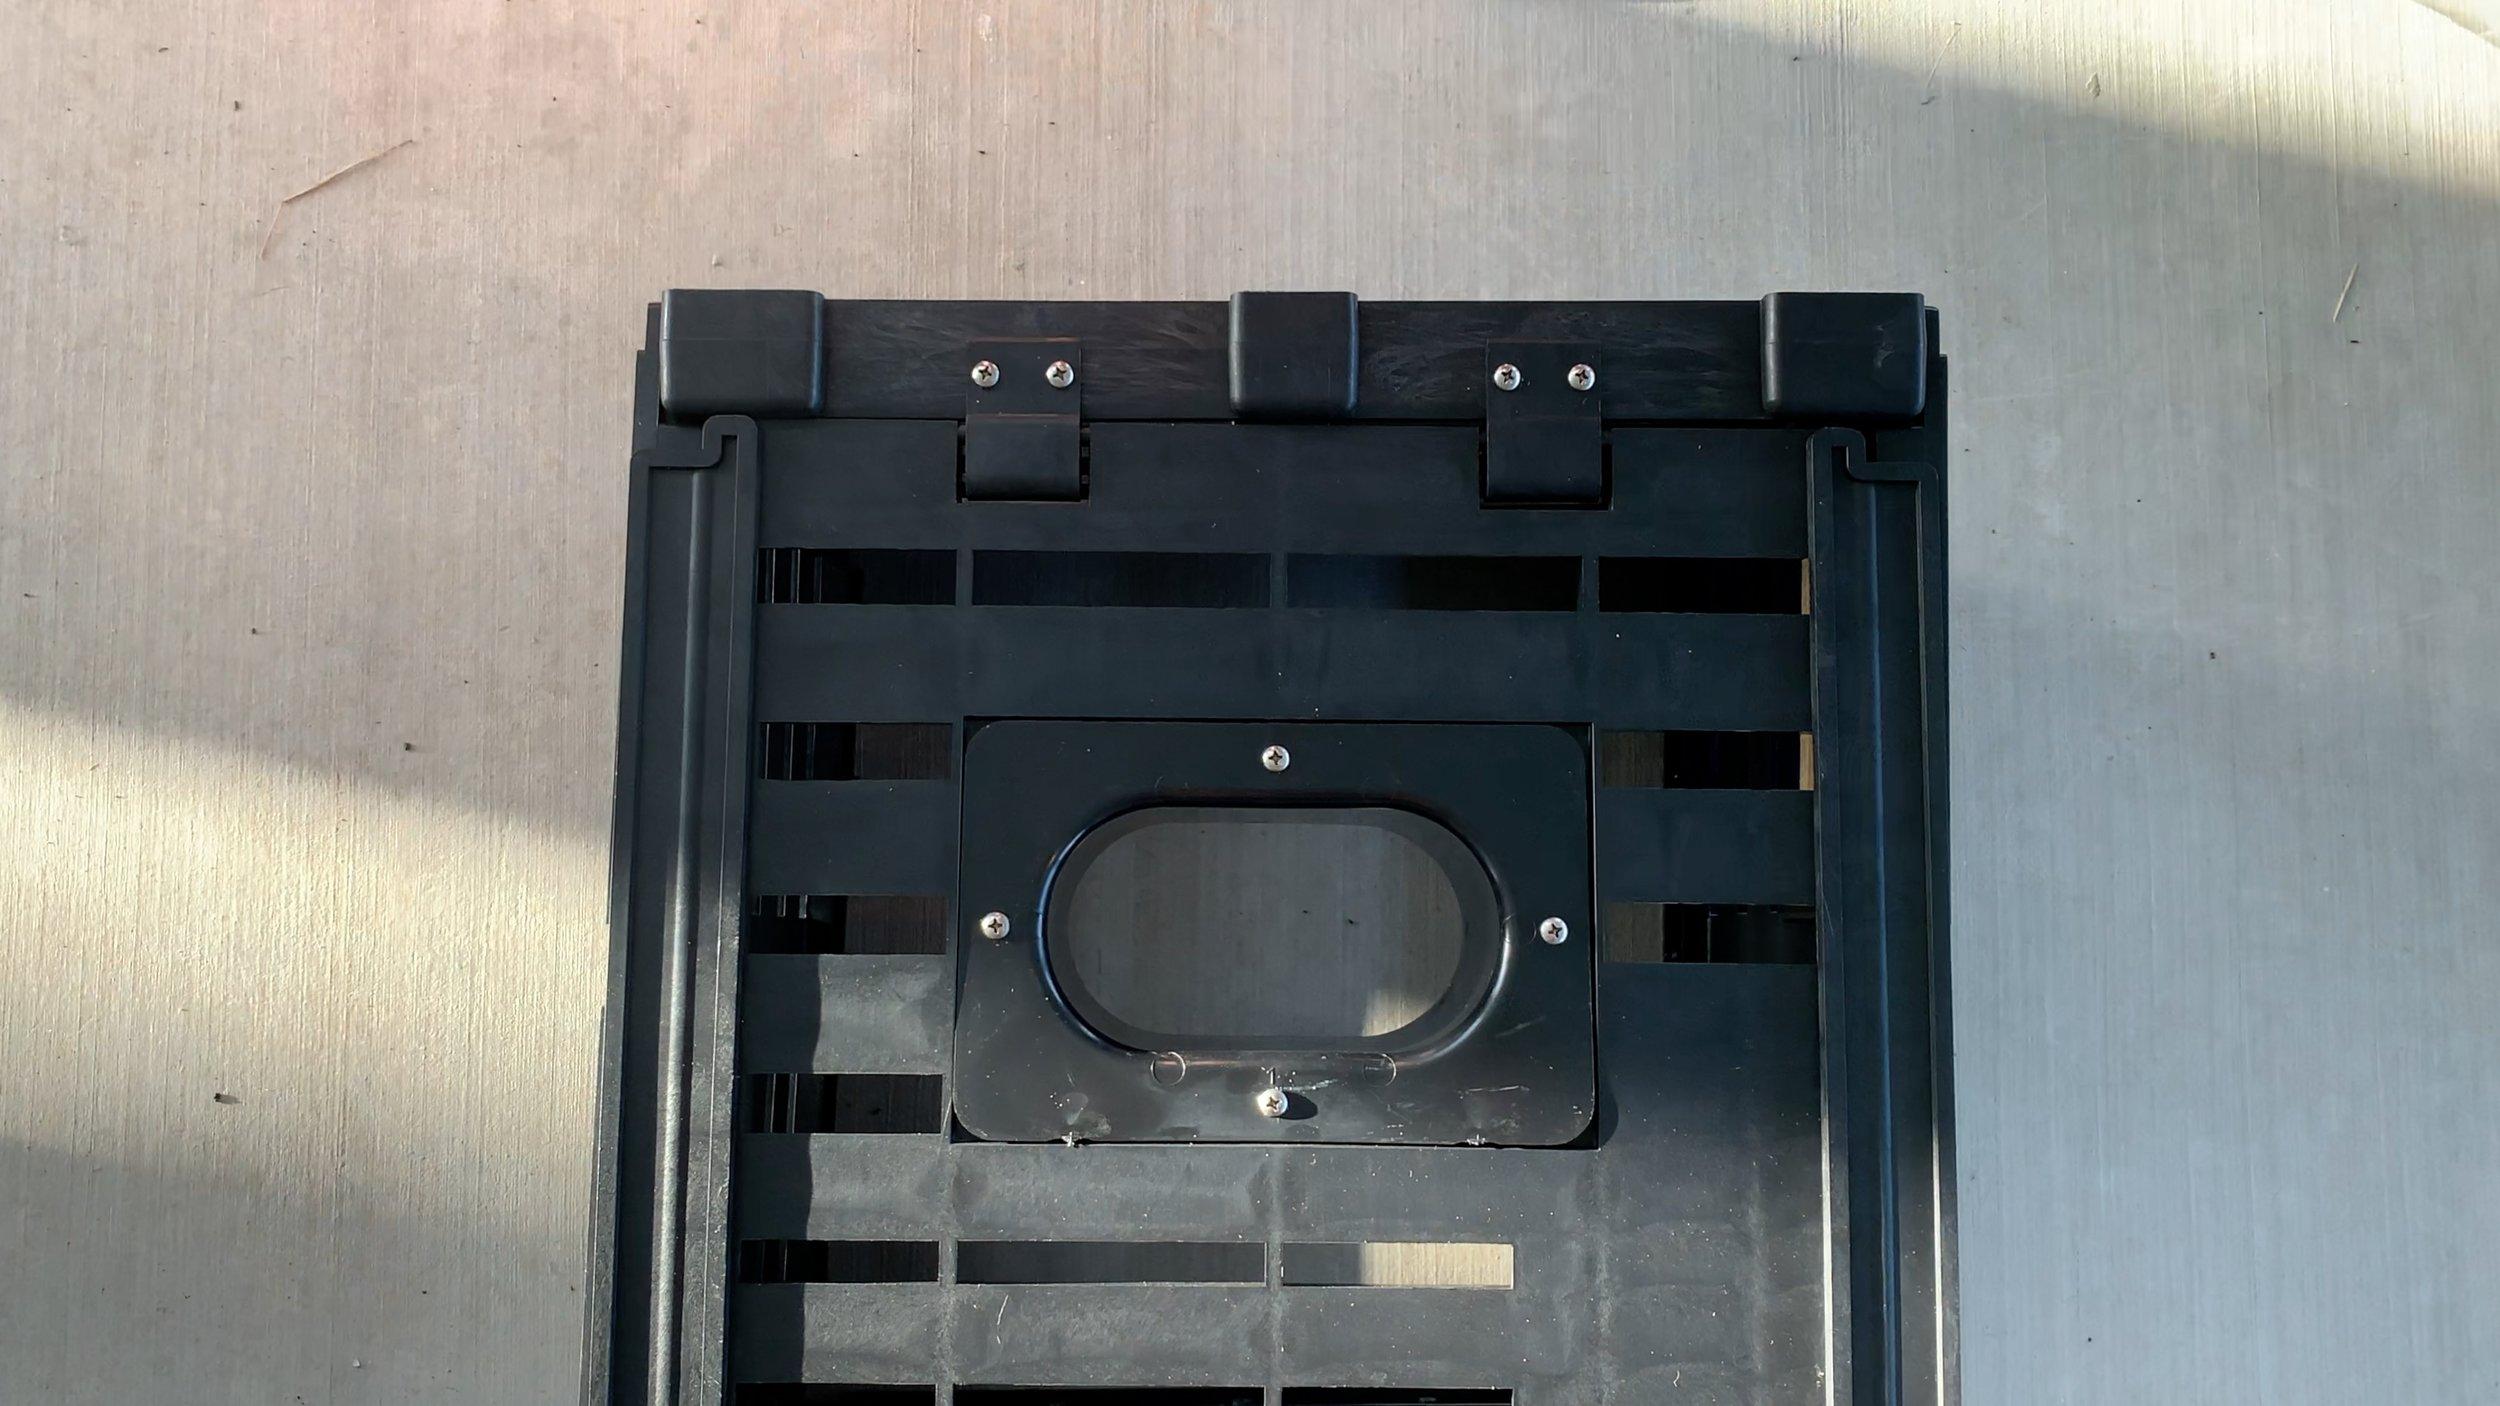 Building traps images 7.jpg